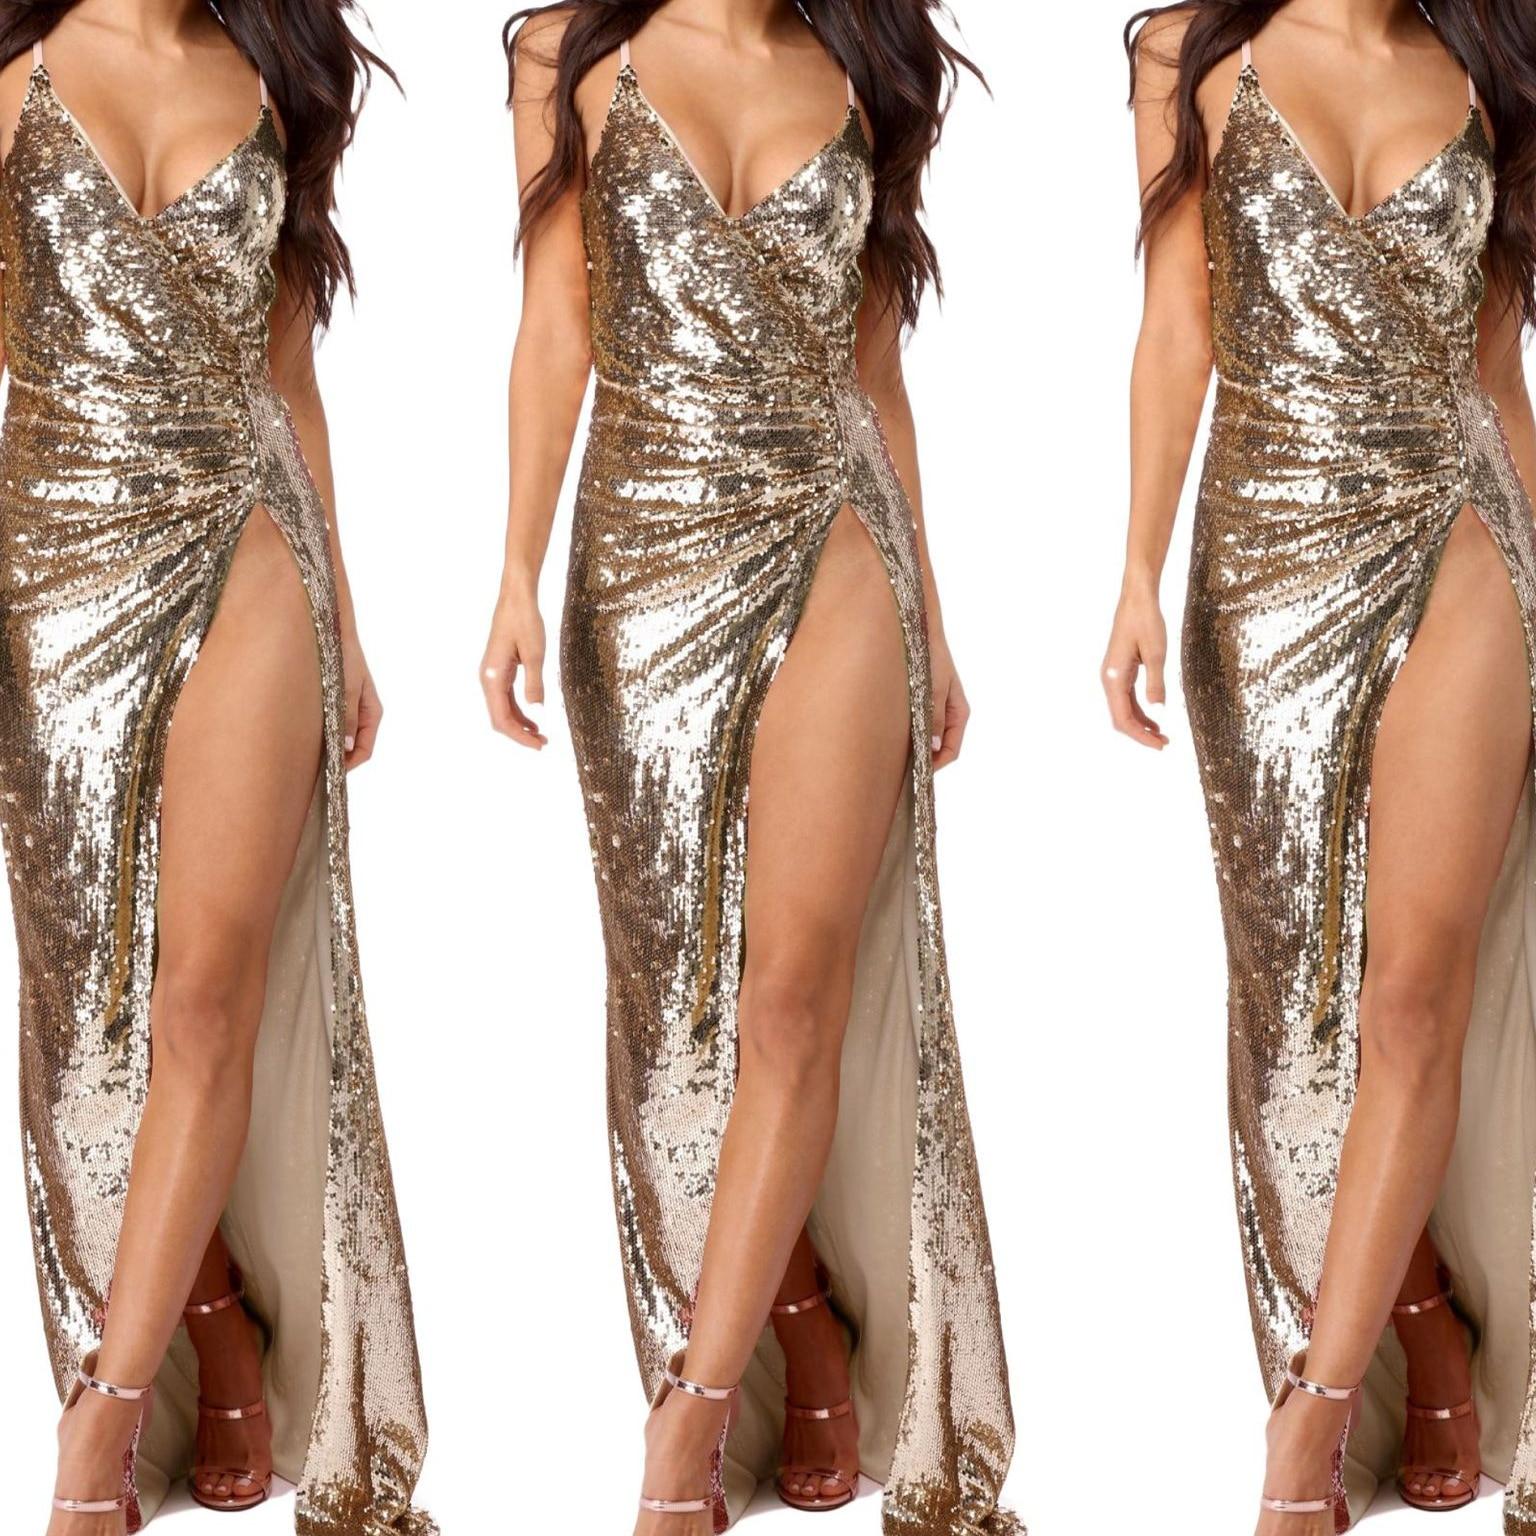 Sequin Maxi Dress Women Sexy High Split Long Dress 2019 Gold Color V Neck Summer Party Dresses Vestidos Femme